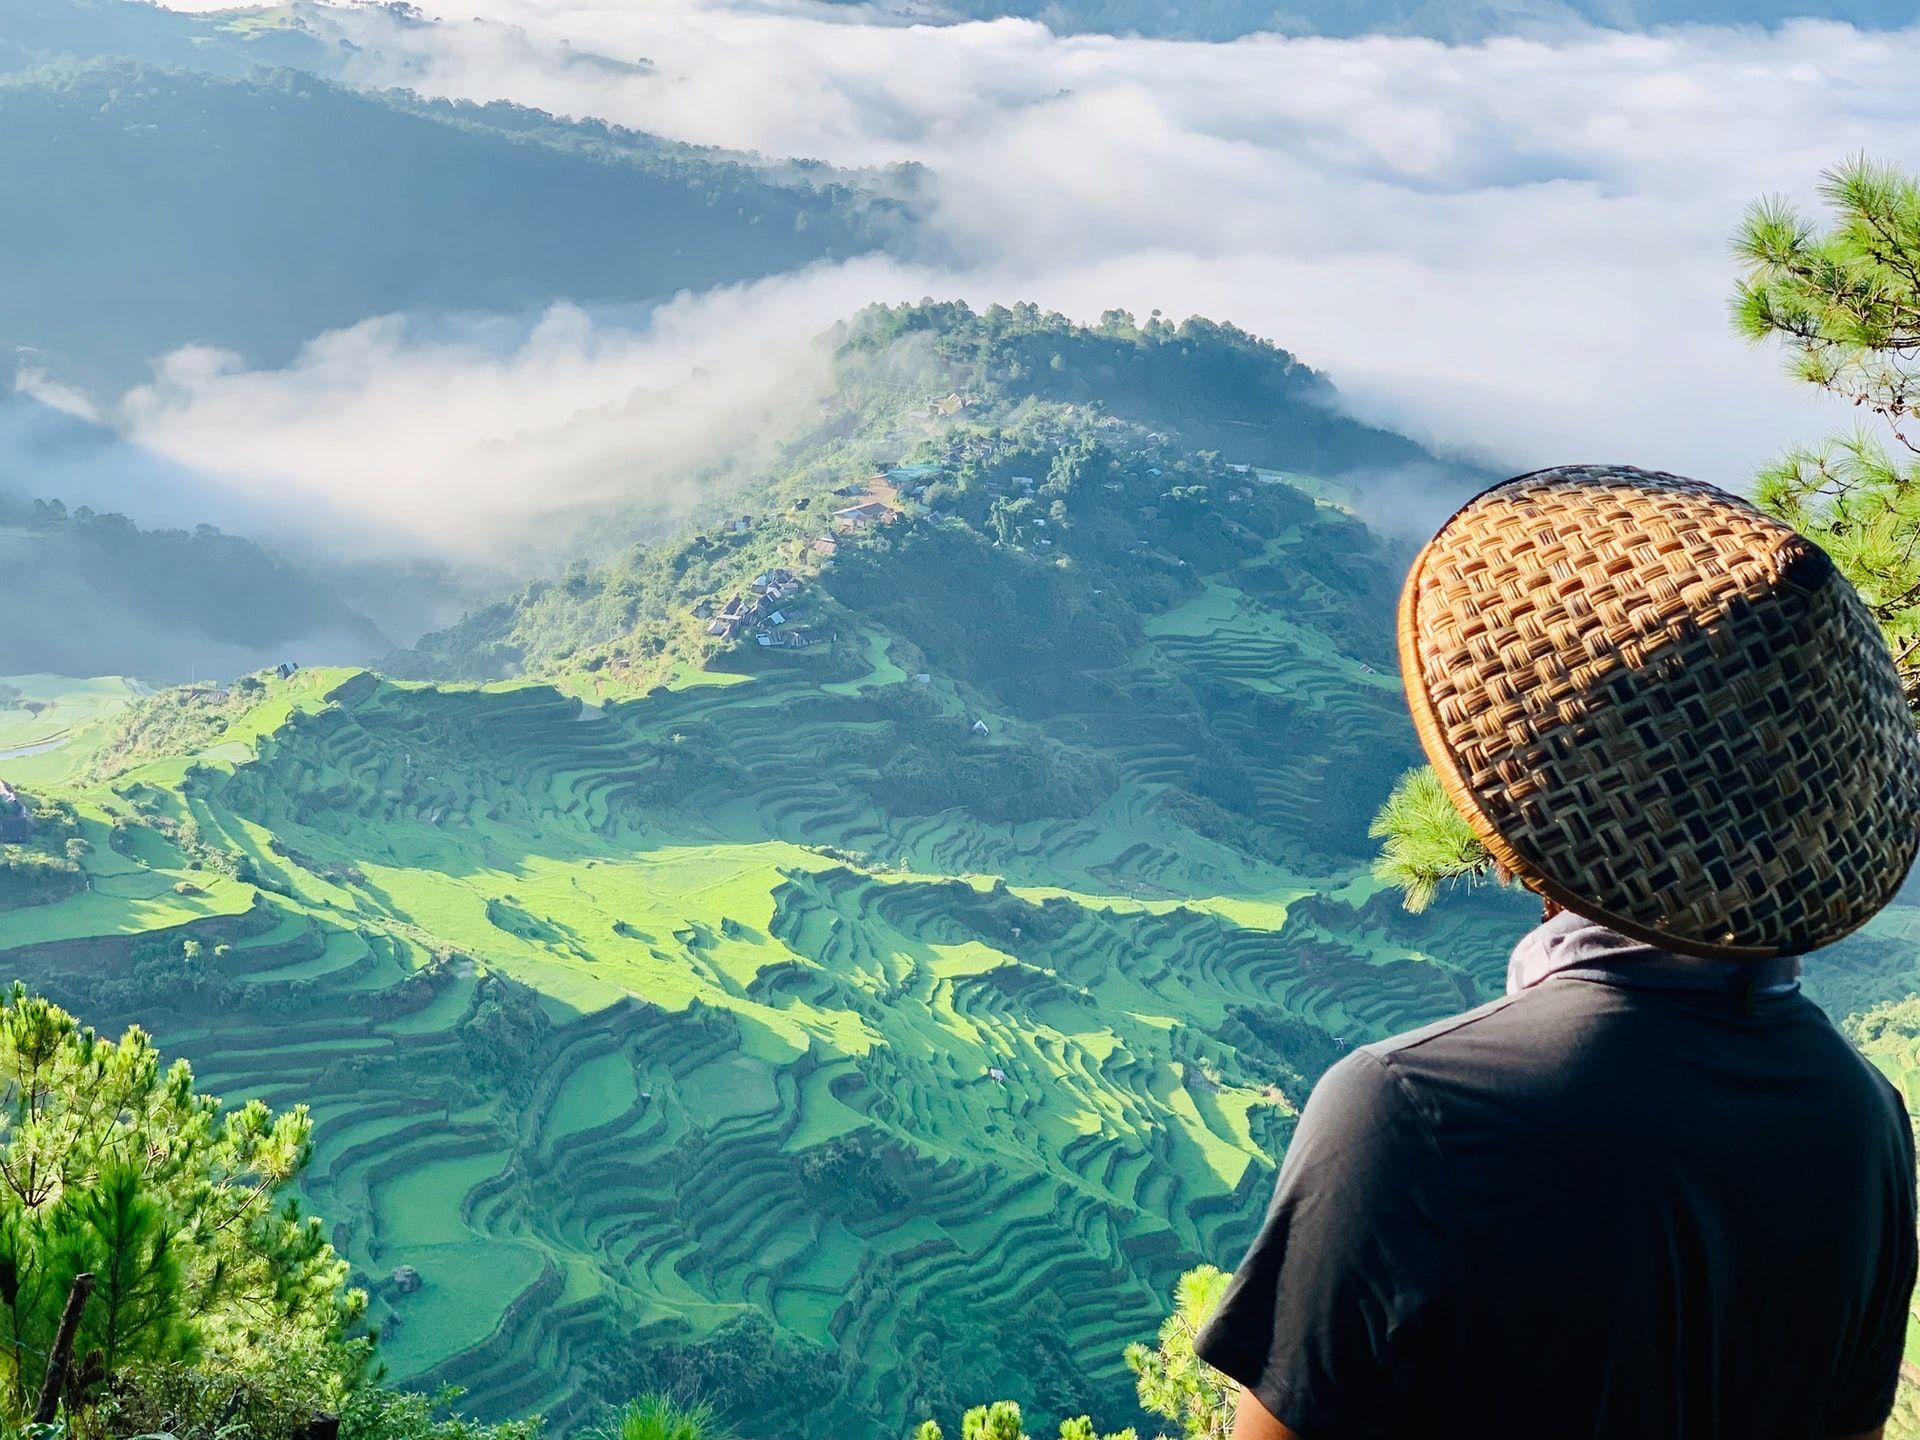 Maligcong, Bontoc, Mountain Province, Philippines | Photo by Michael Rivera on Unsplash